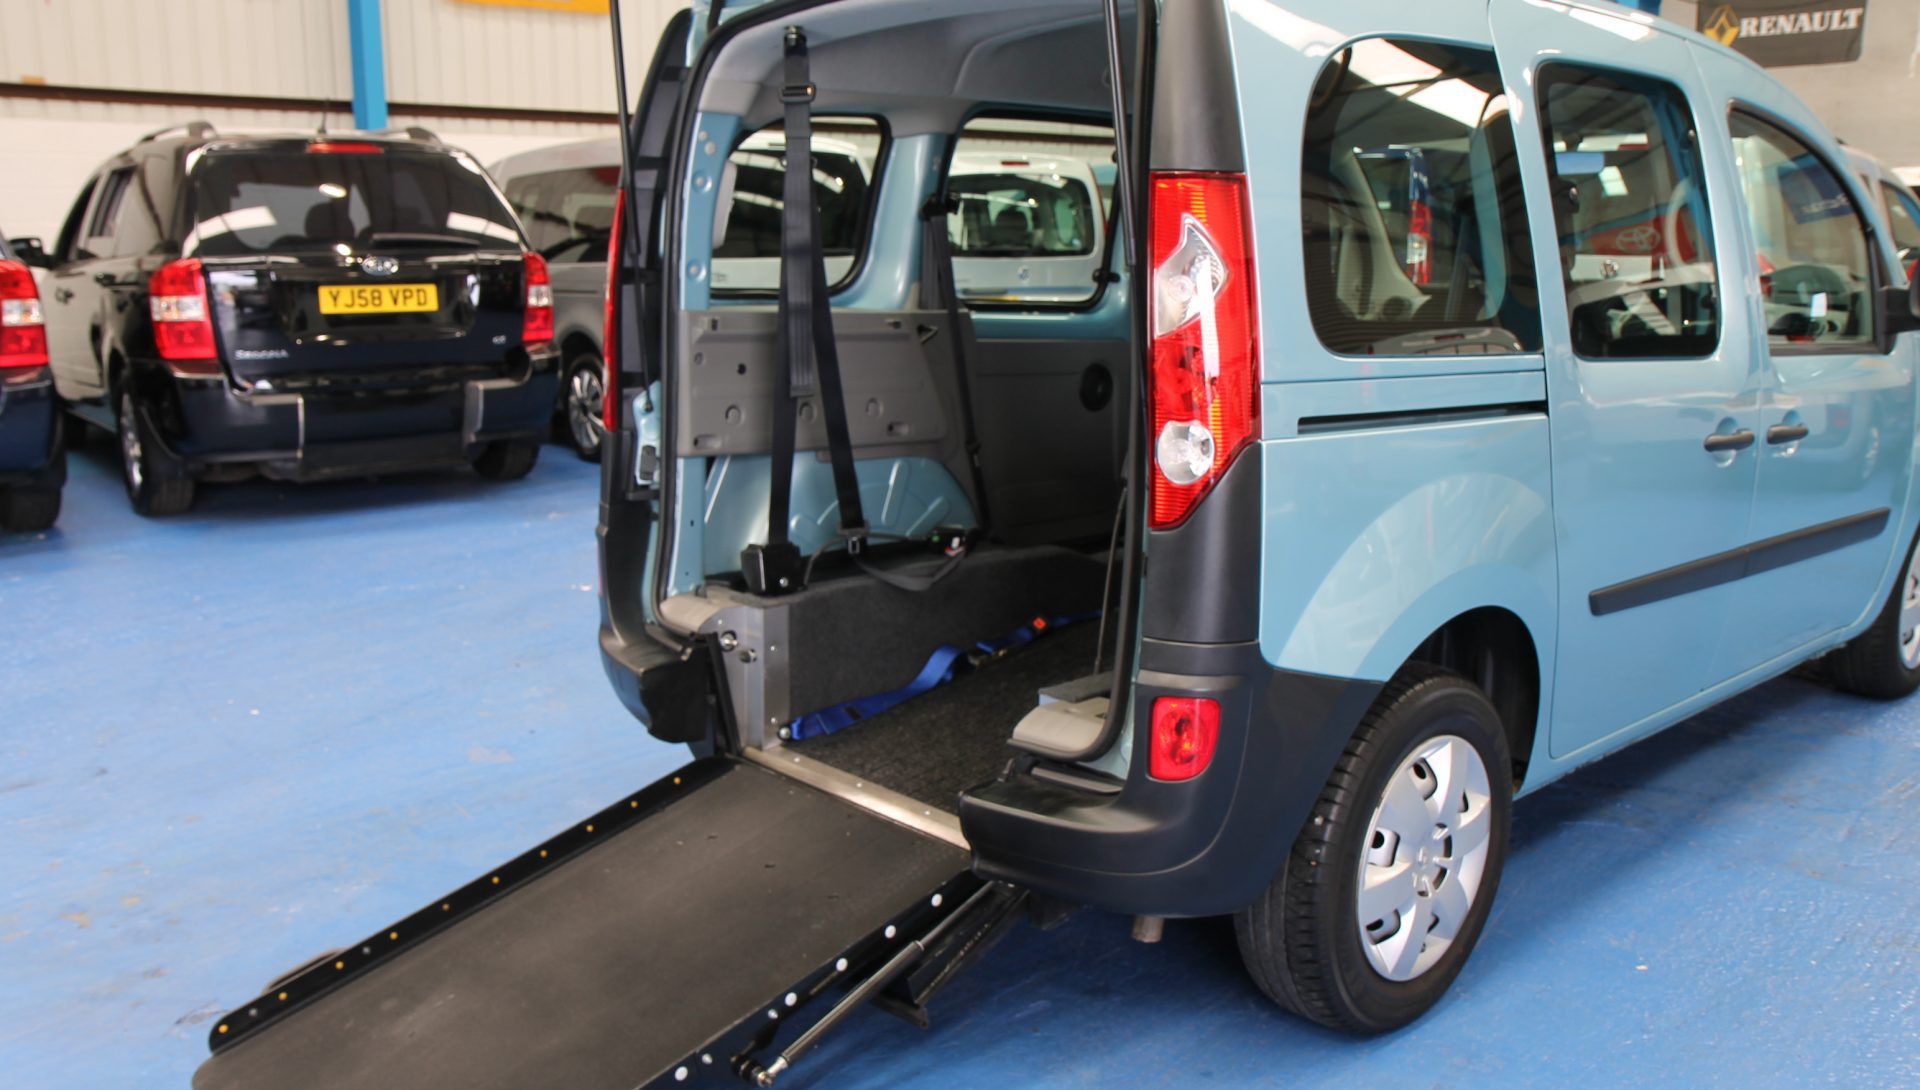 Kangoo wheelchair vehicle gx11 dmv